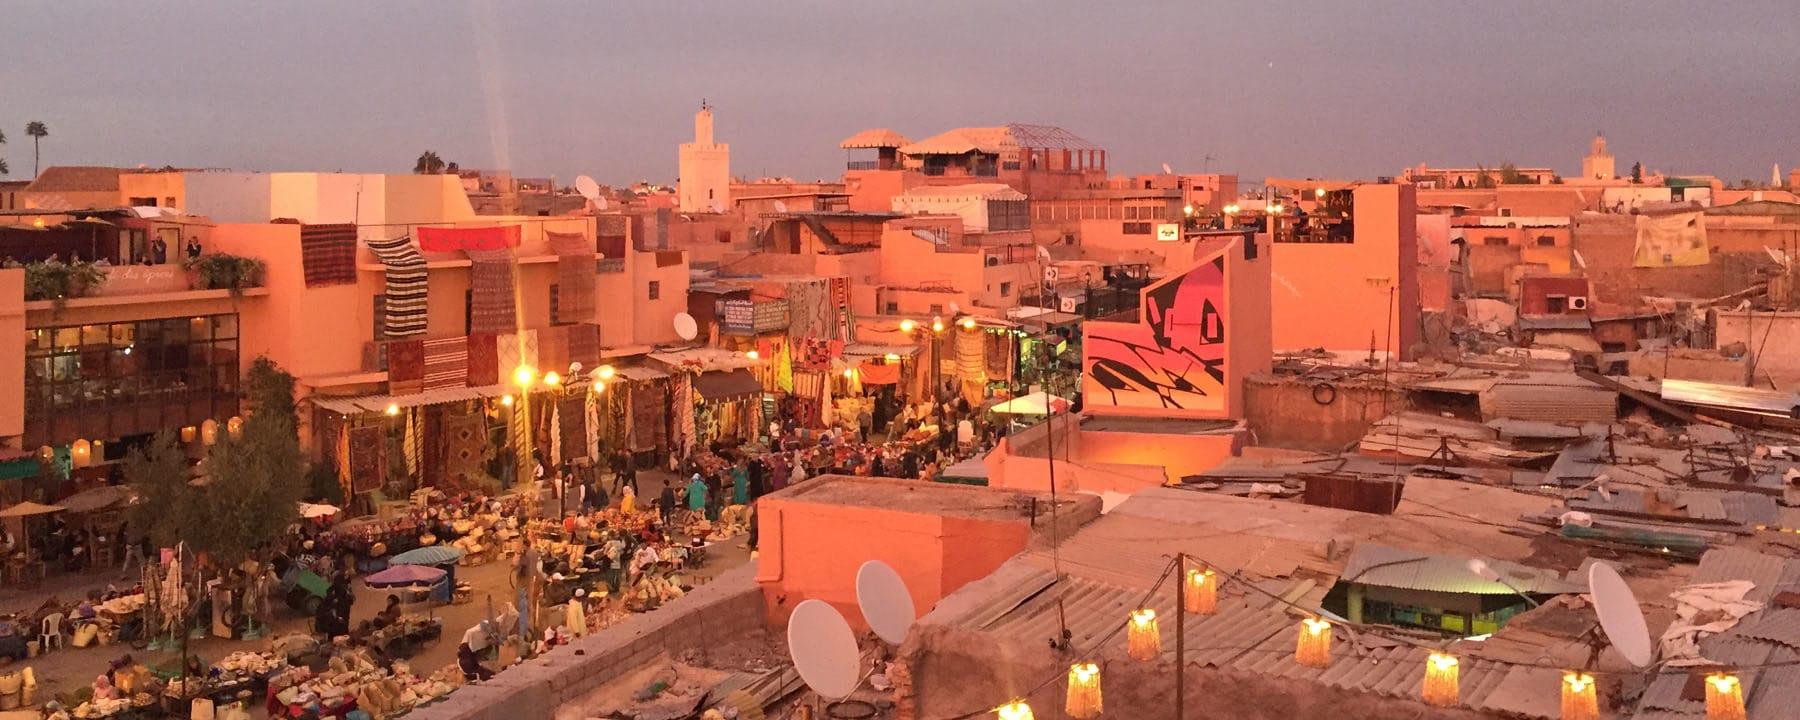 Yoga Retreat Marrakech sunset_Source NOSADE